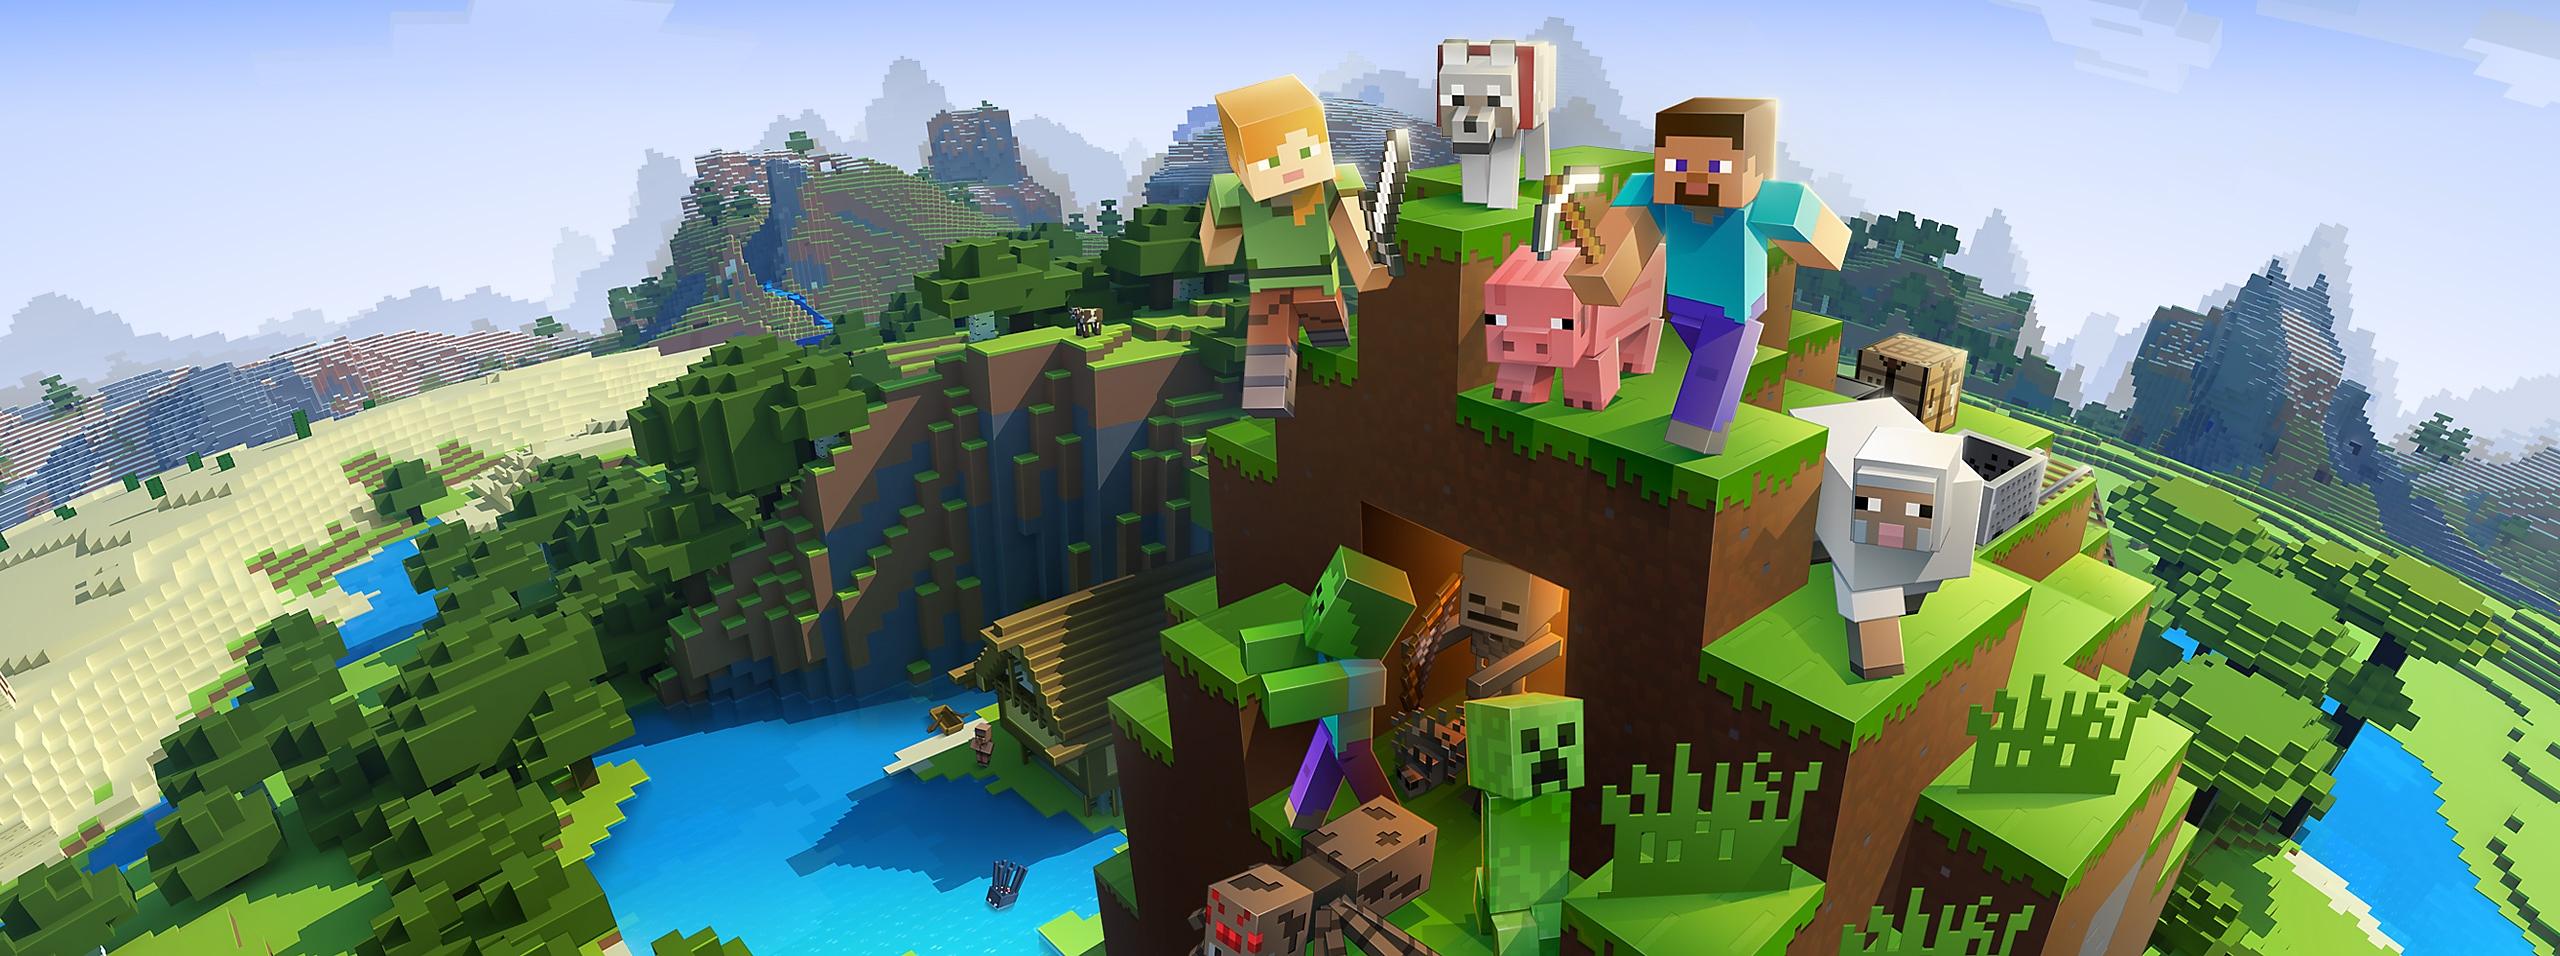 Minecraft - Hero Art